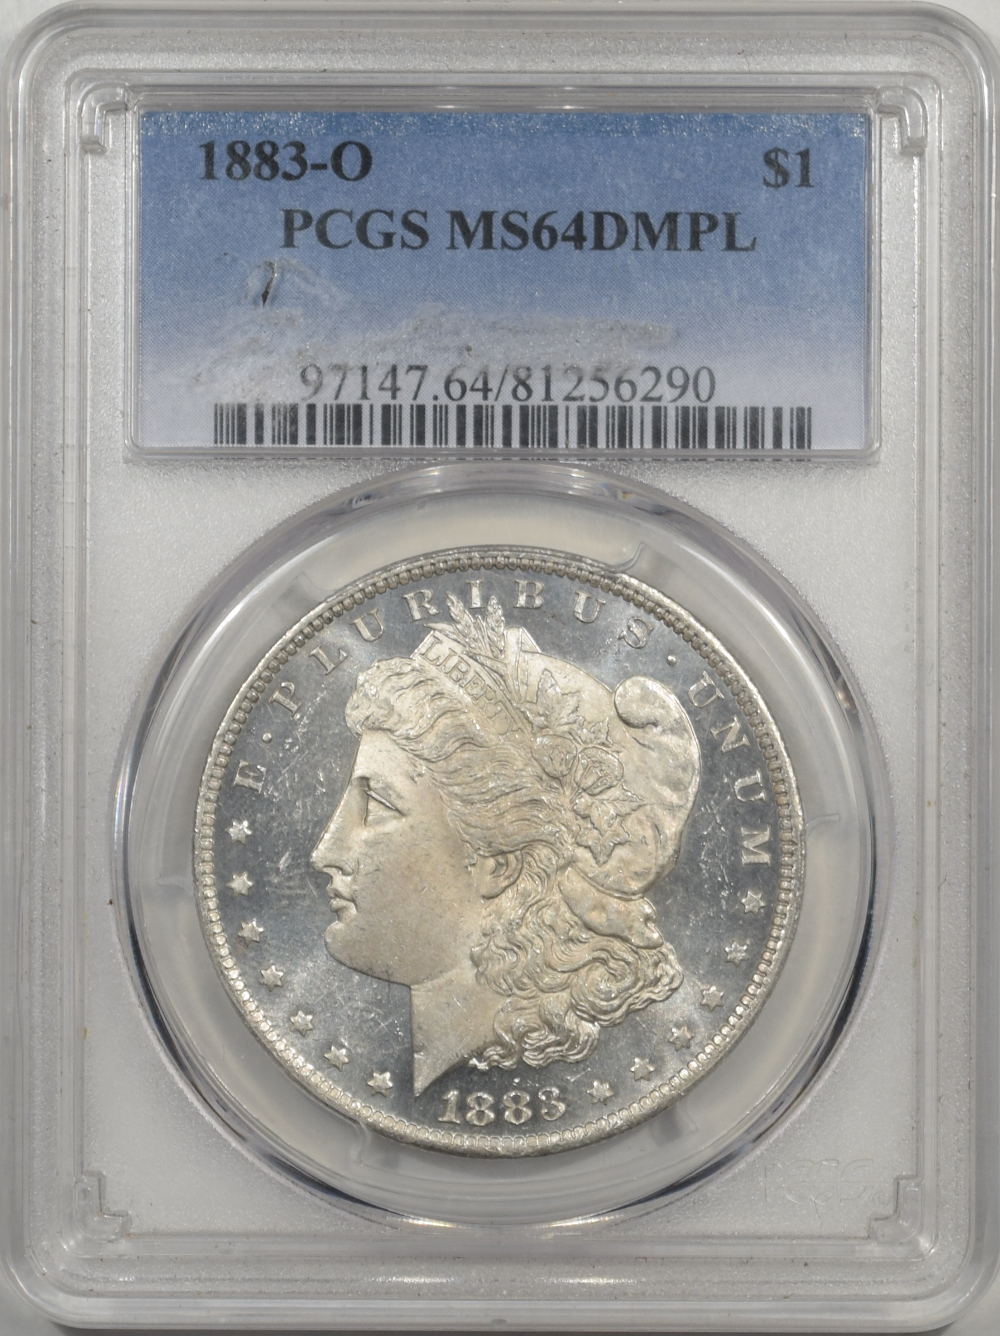 1883-O US Morgan Silver Dollar $1 PCGS MS64